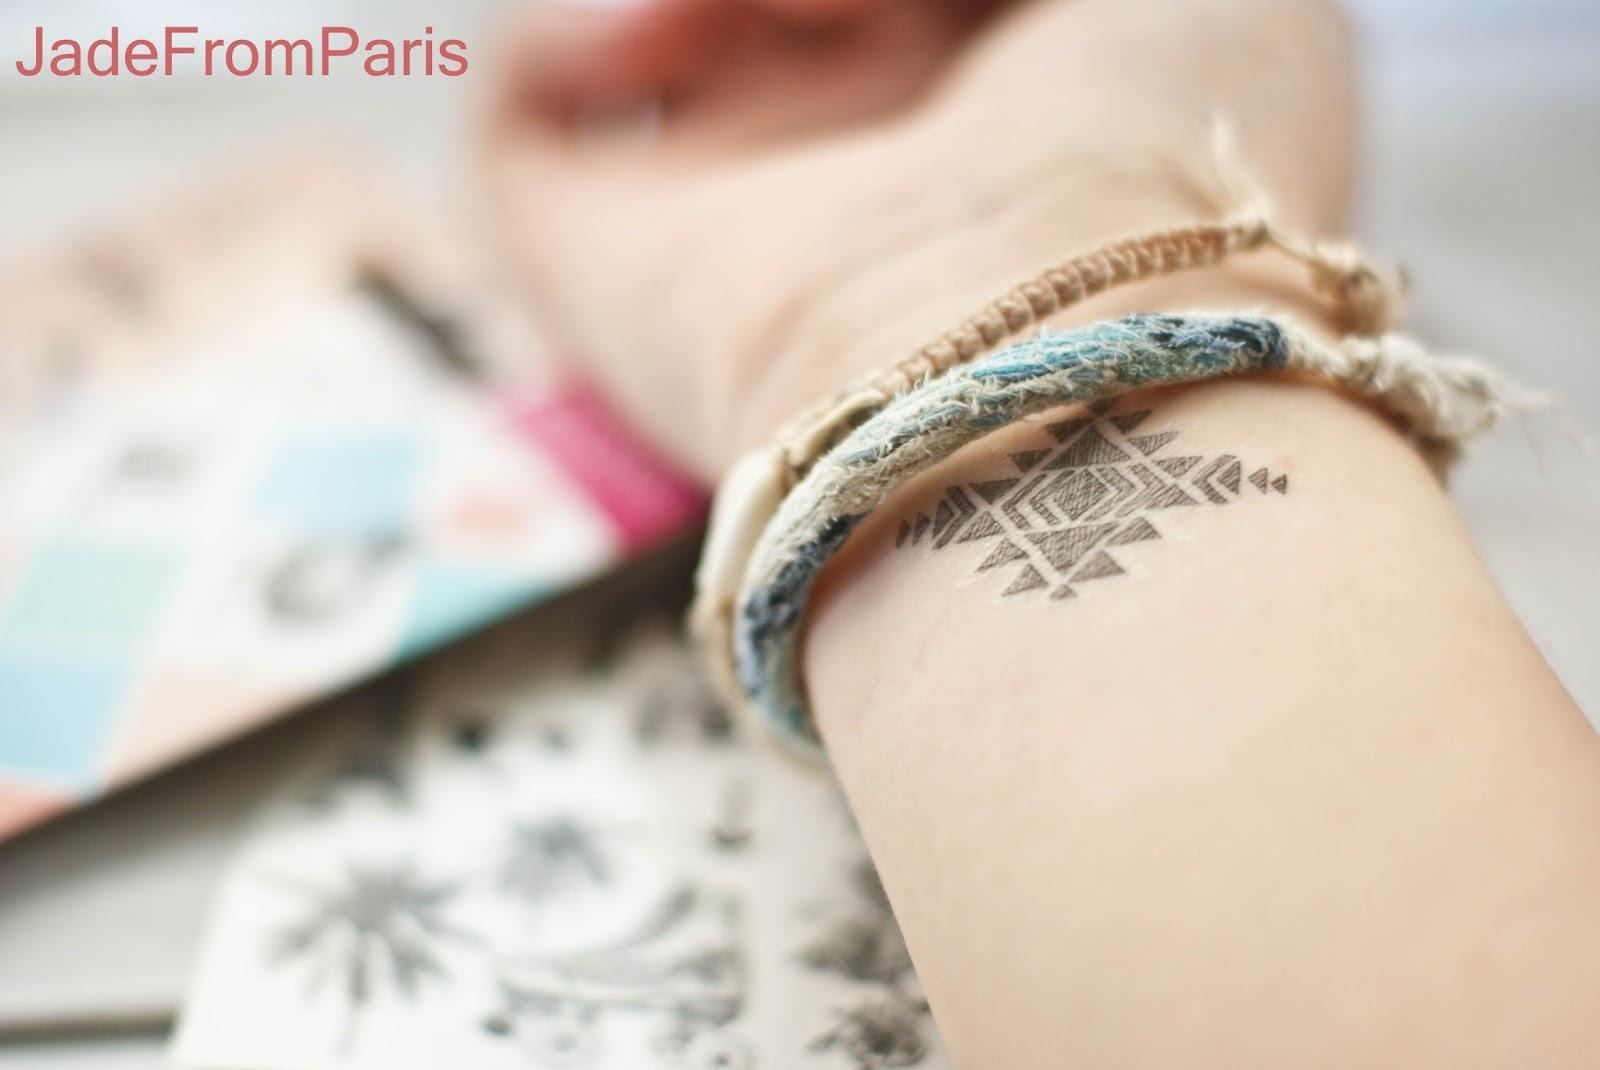 Tatouage poignet 40 idées de tatouages poignets Elle - prix petit tatouage poignet